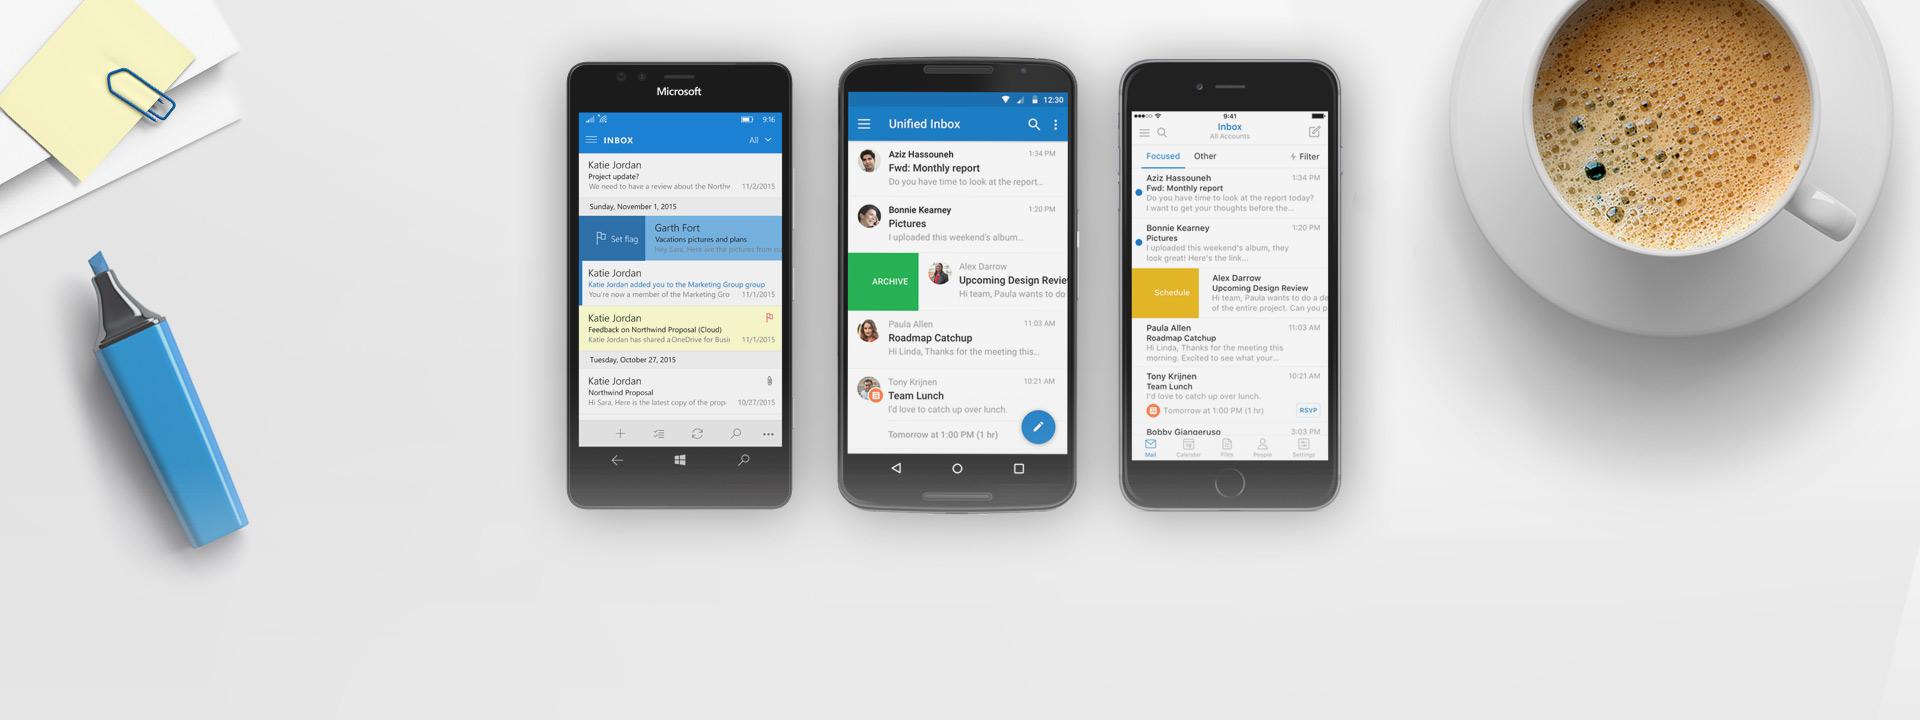 Windows Phone وiPhone وهاتف Android مزودة بتطبيق Outlook الذي يظهر على الشاشات